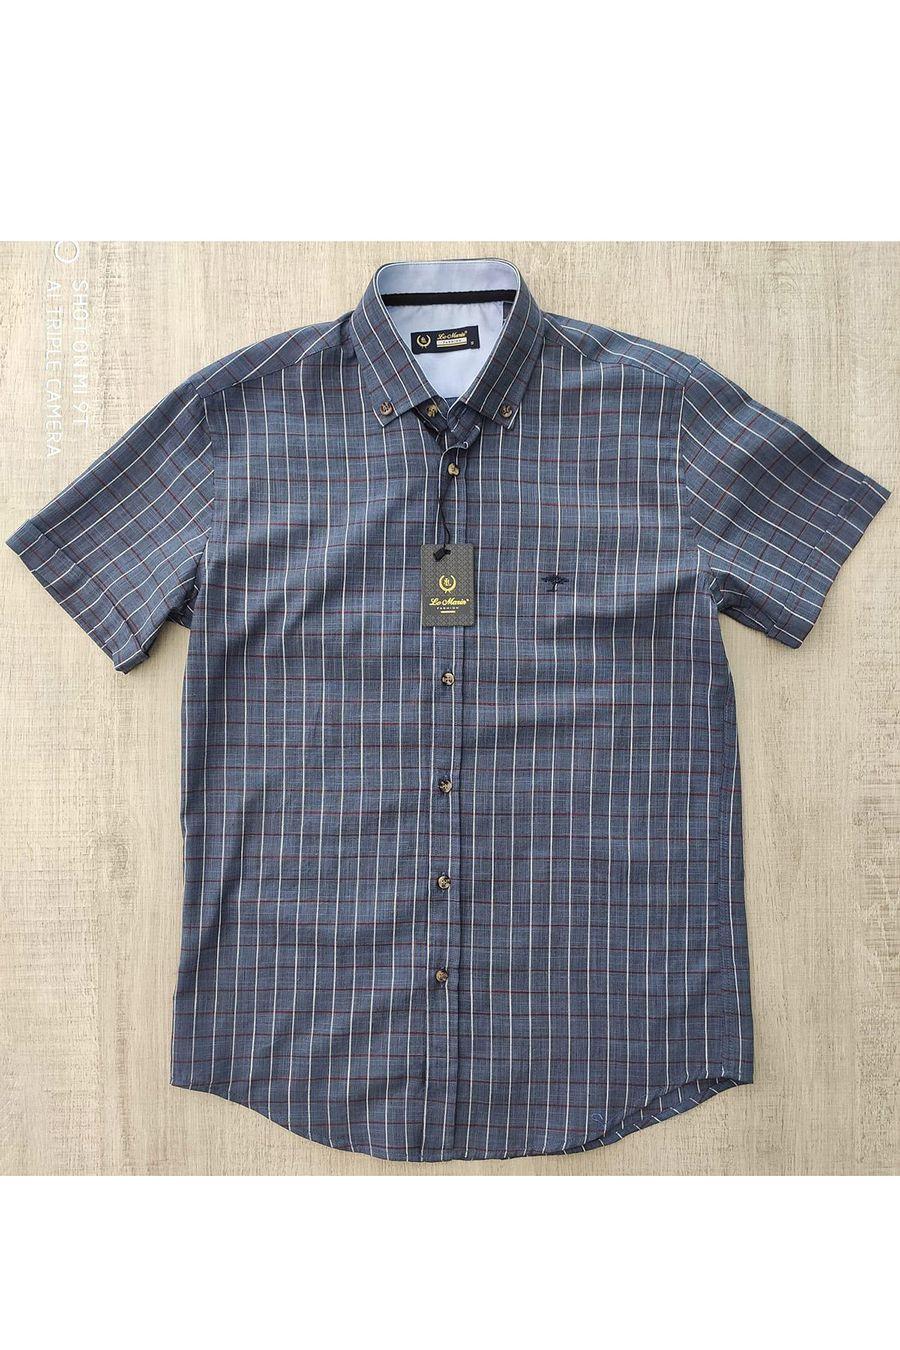 Рубашка мужская Le Marin 701 - фото 1